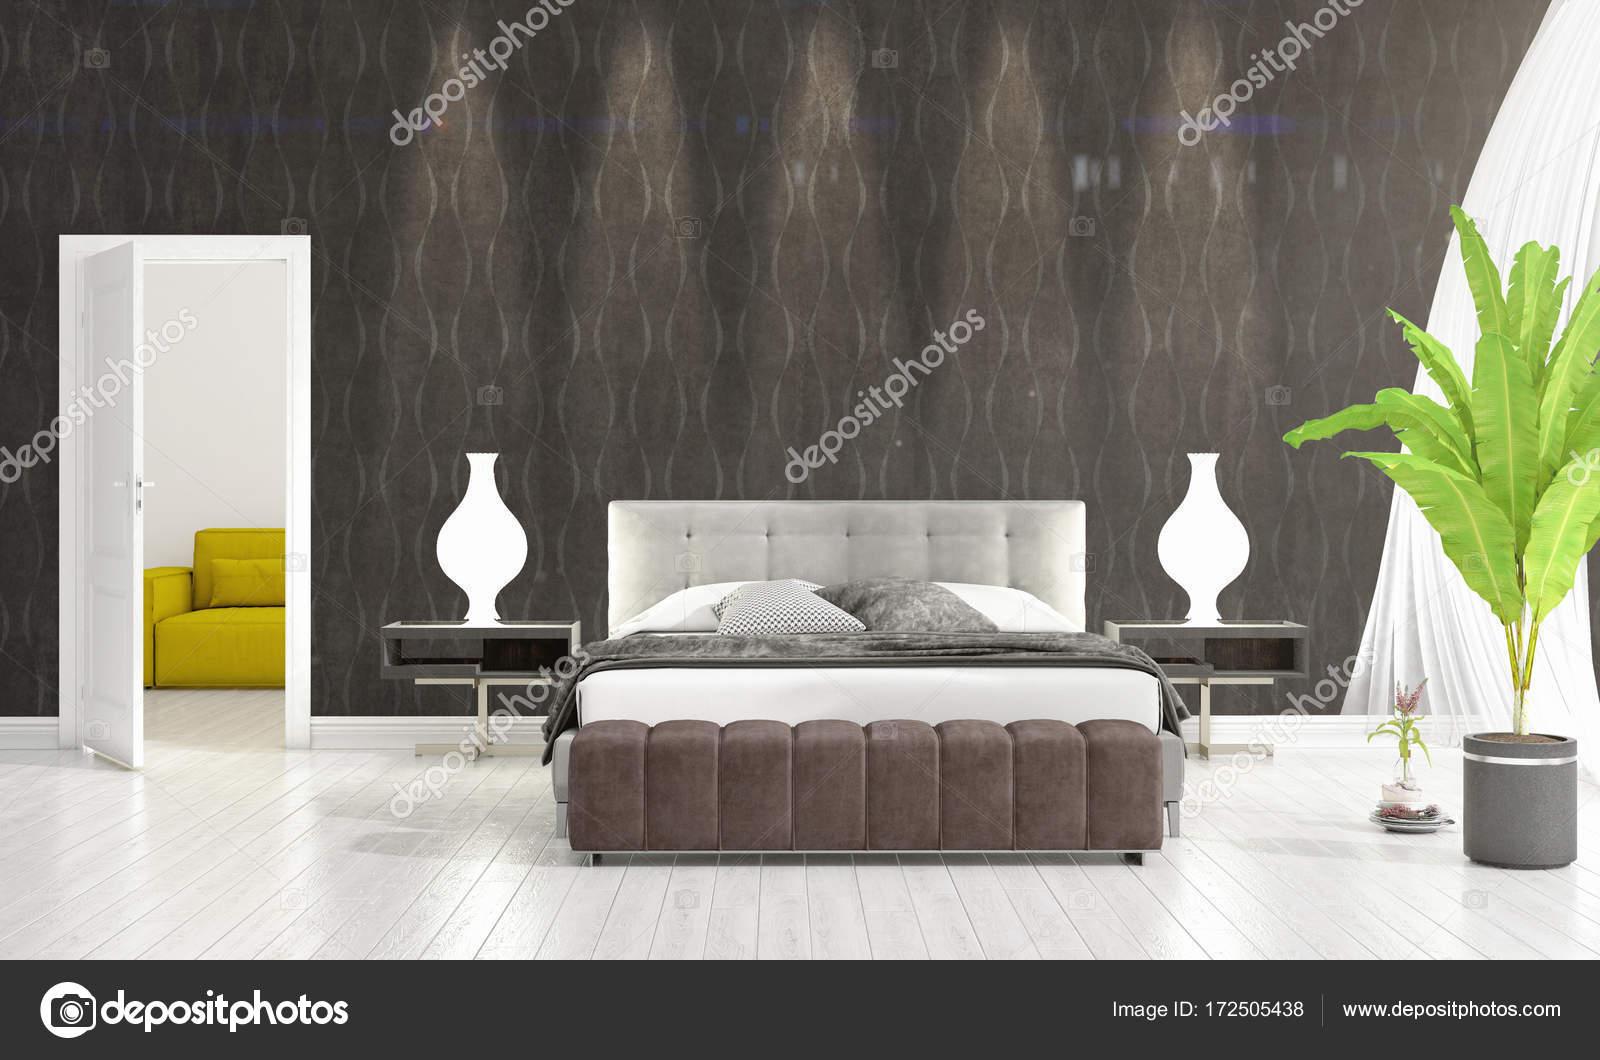 Modern interieur van slaapkamer in zwang met plant- en copyspace in ...